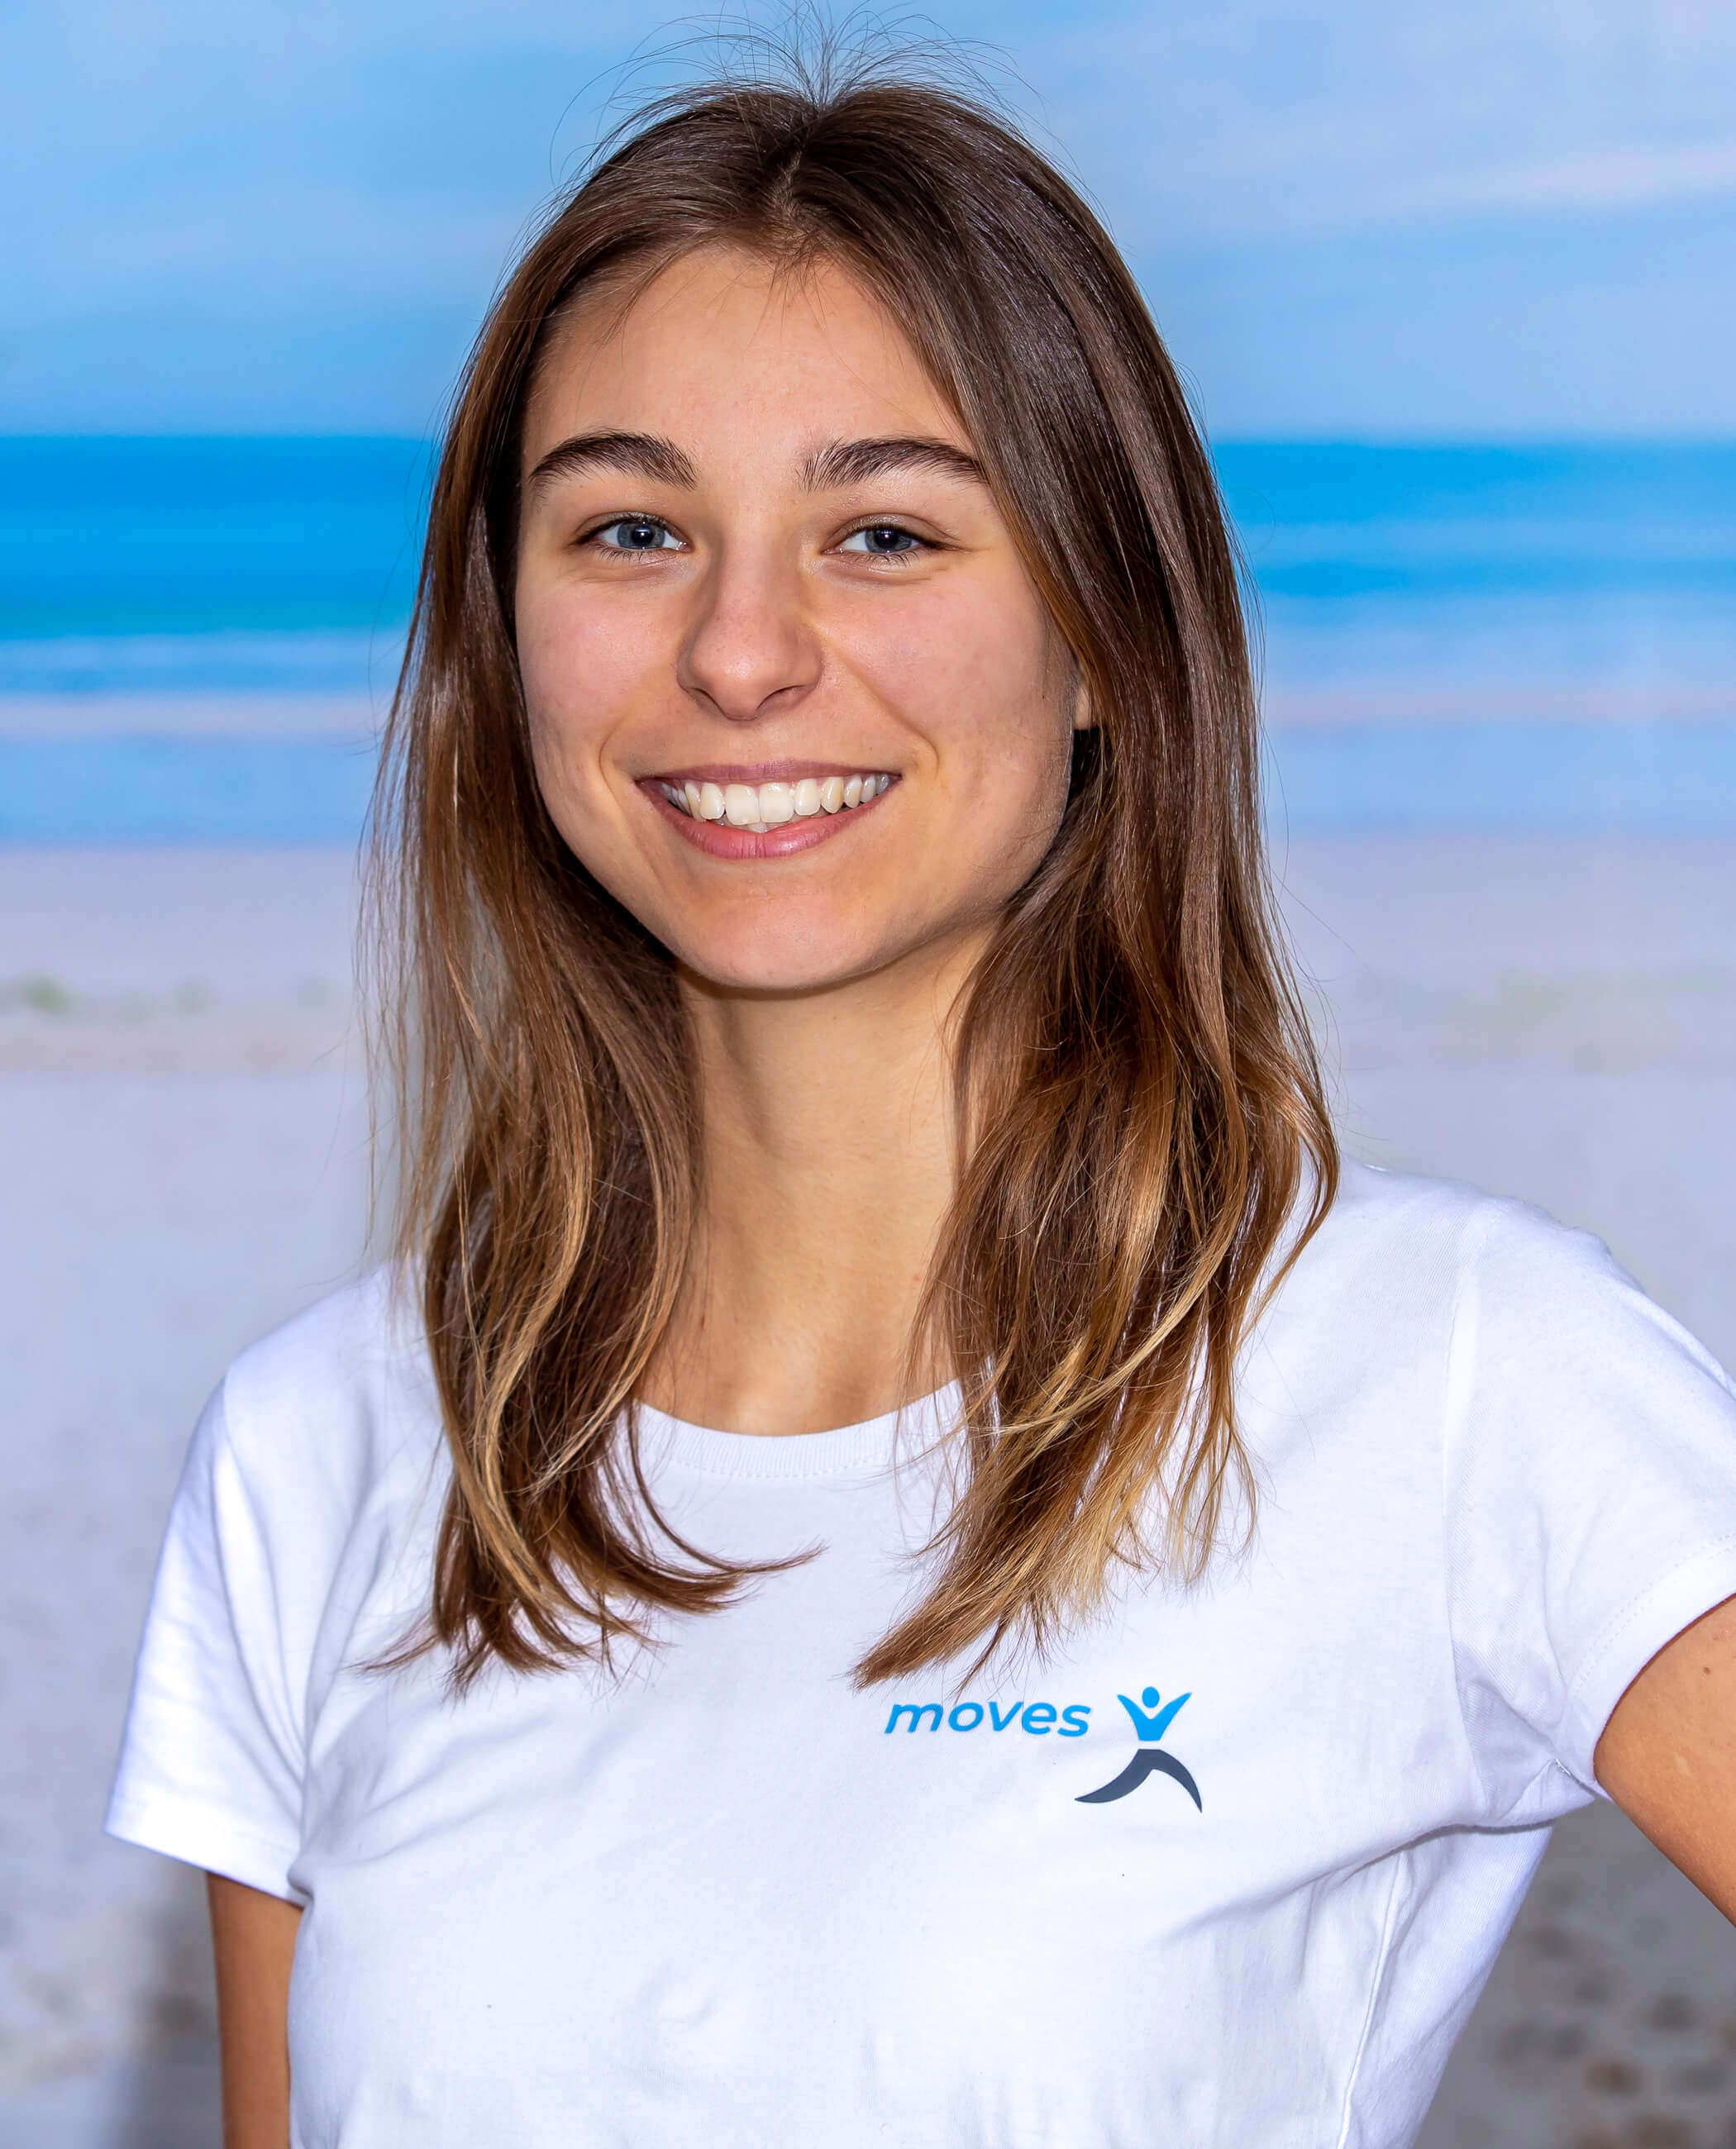 Melina Neumann